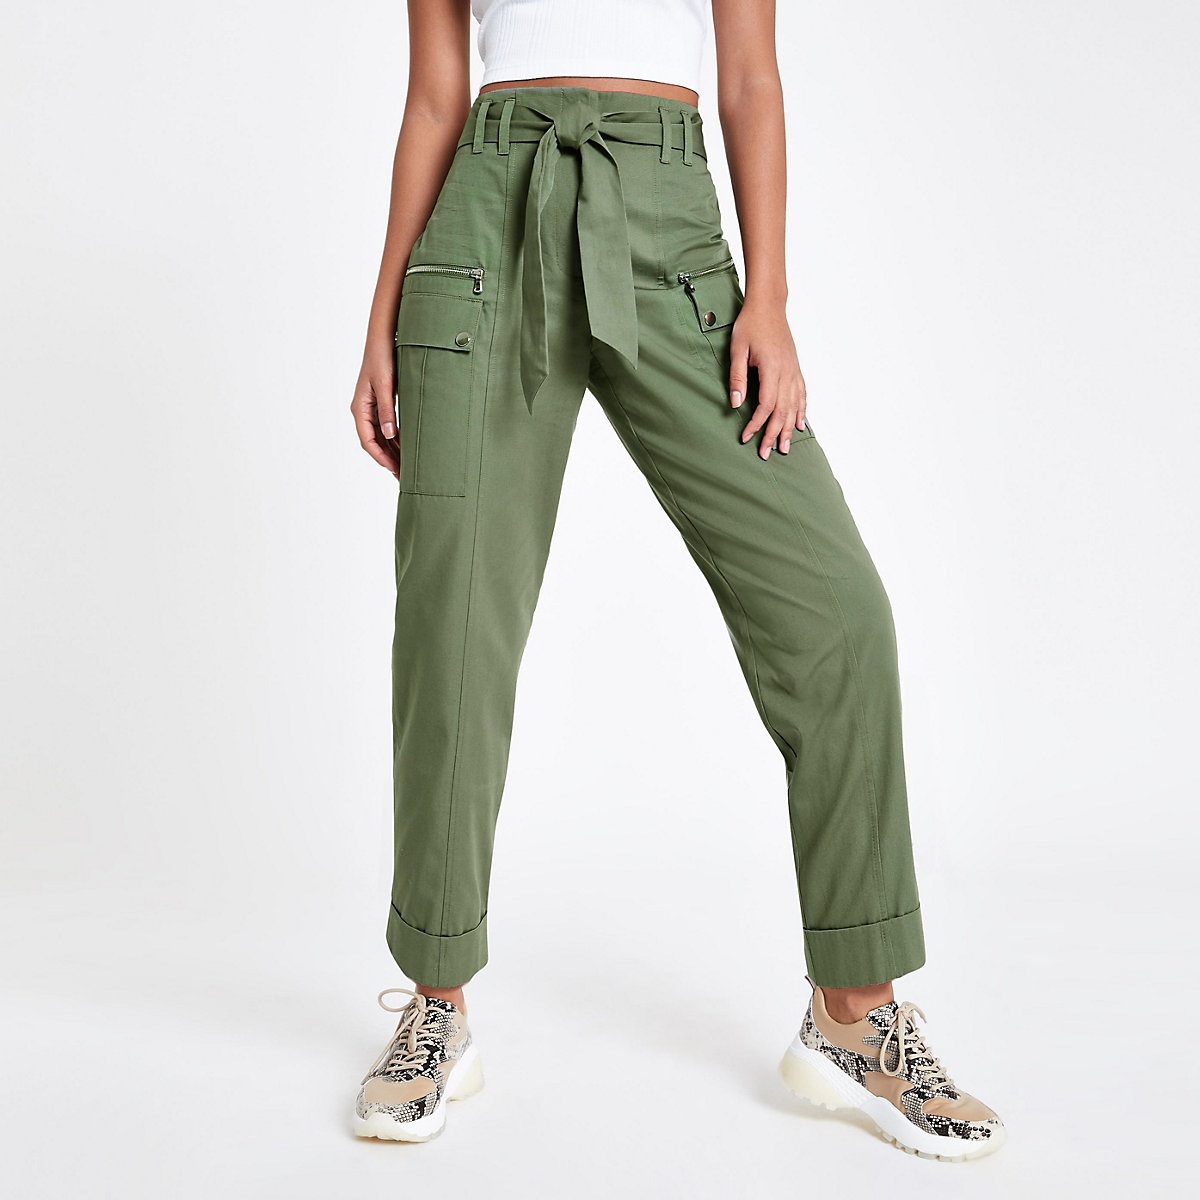 Khaki utility peg trousers